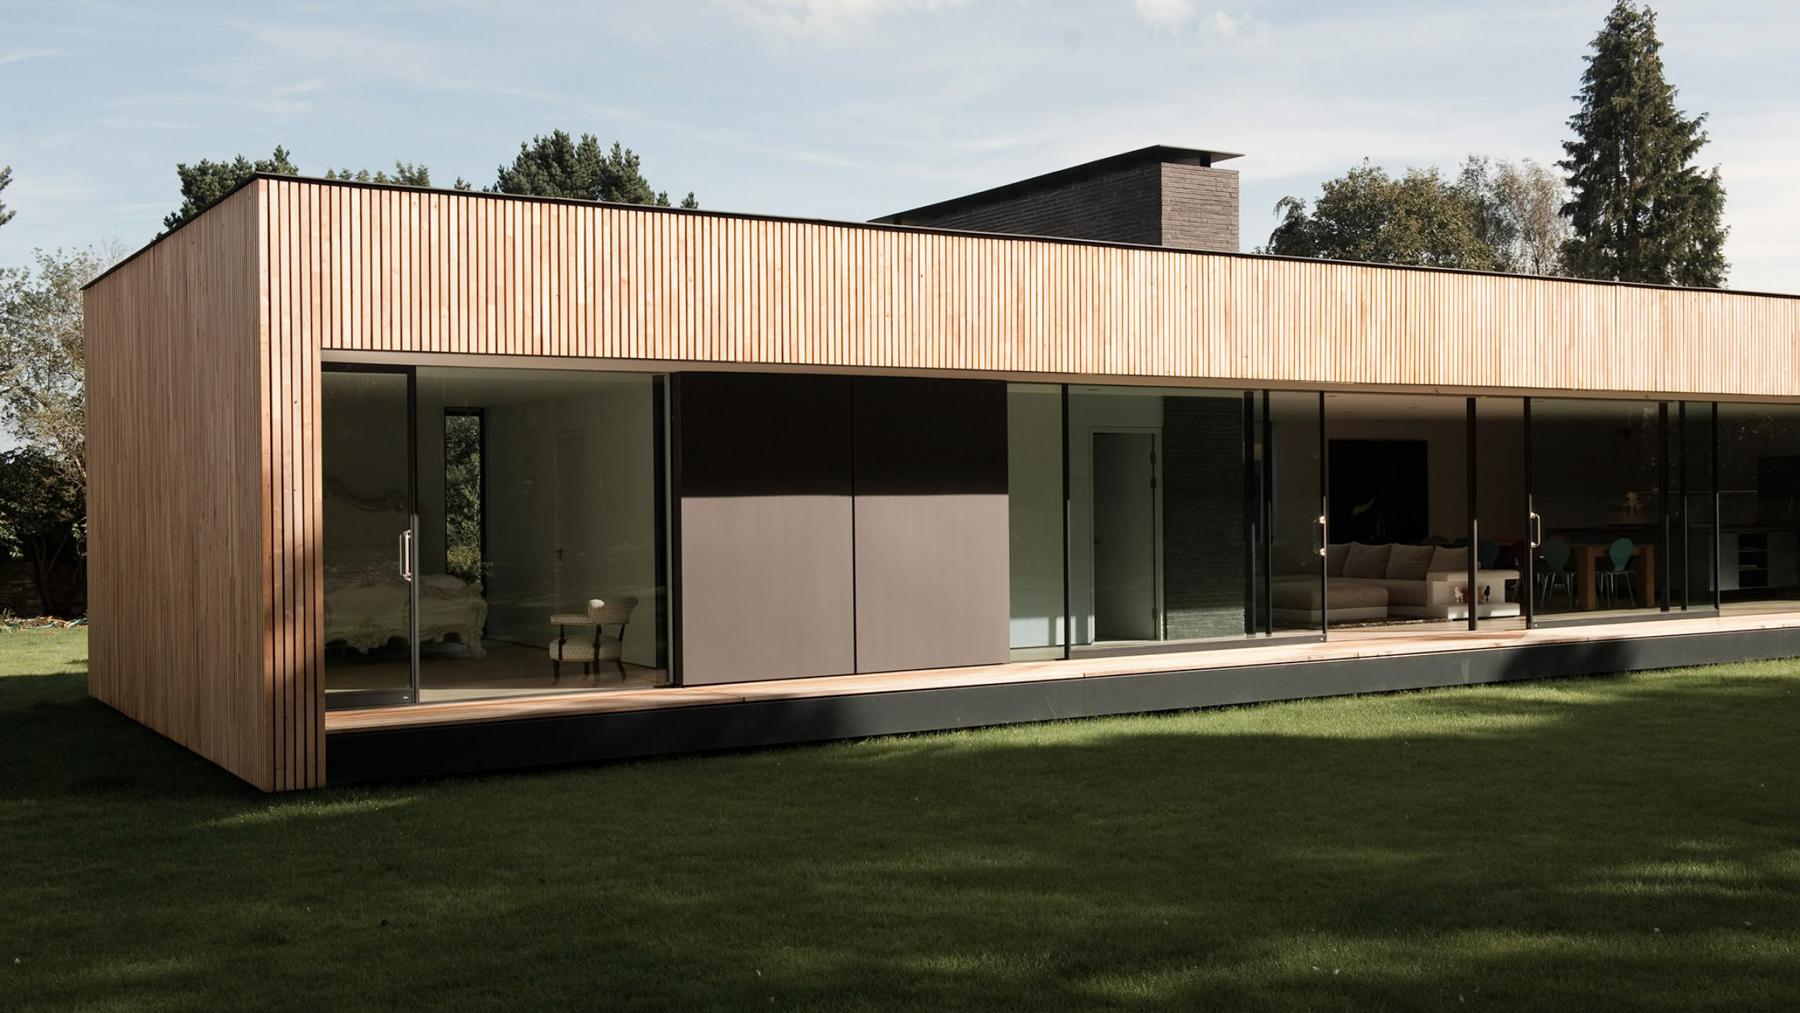 CroppedFocusedImage25601440-Strom-Architects-Watson-4.jpg